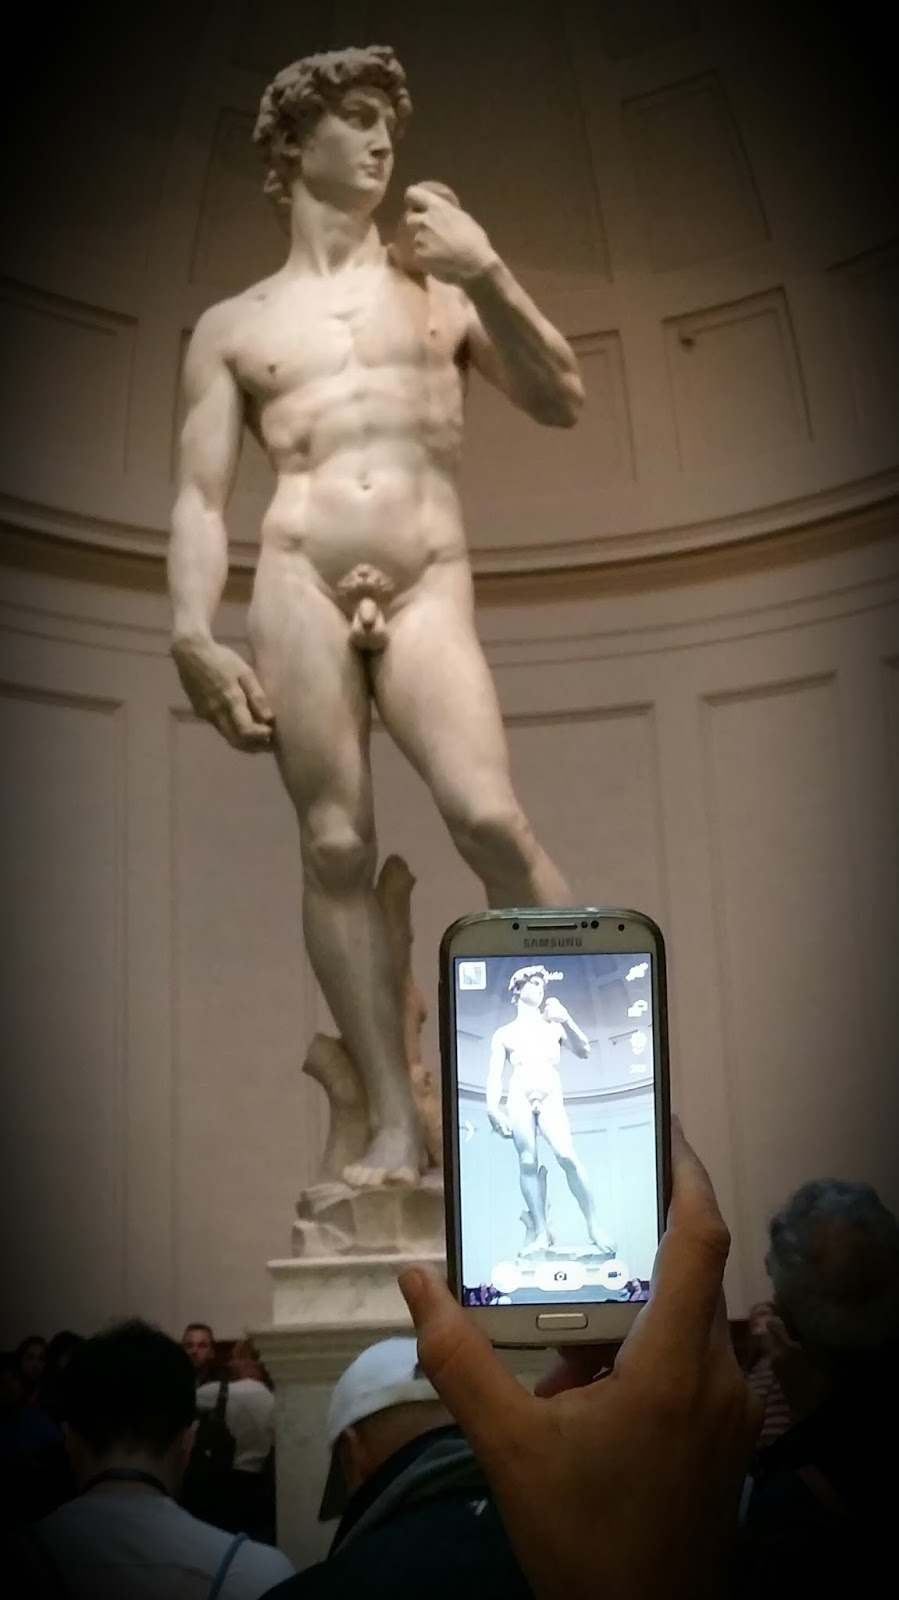 Alicia gimenez hombres desnudos pelicula